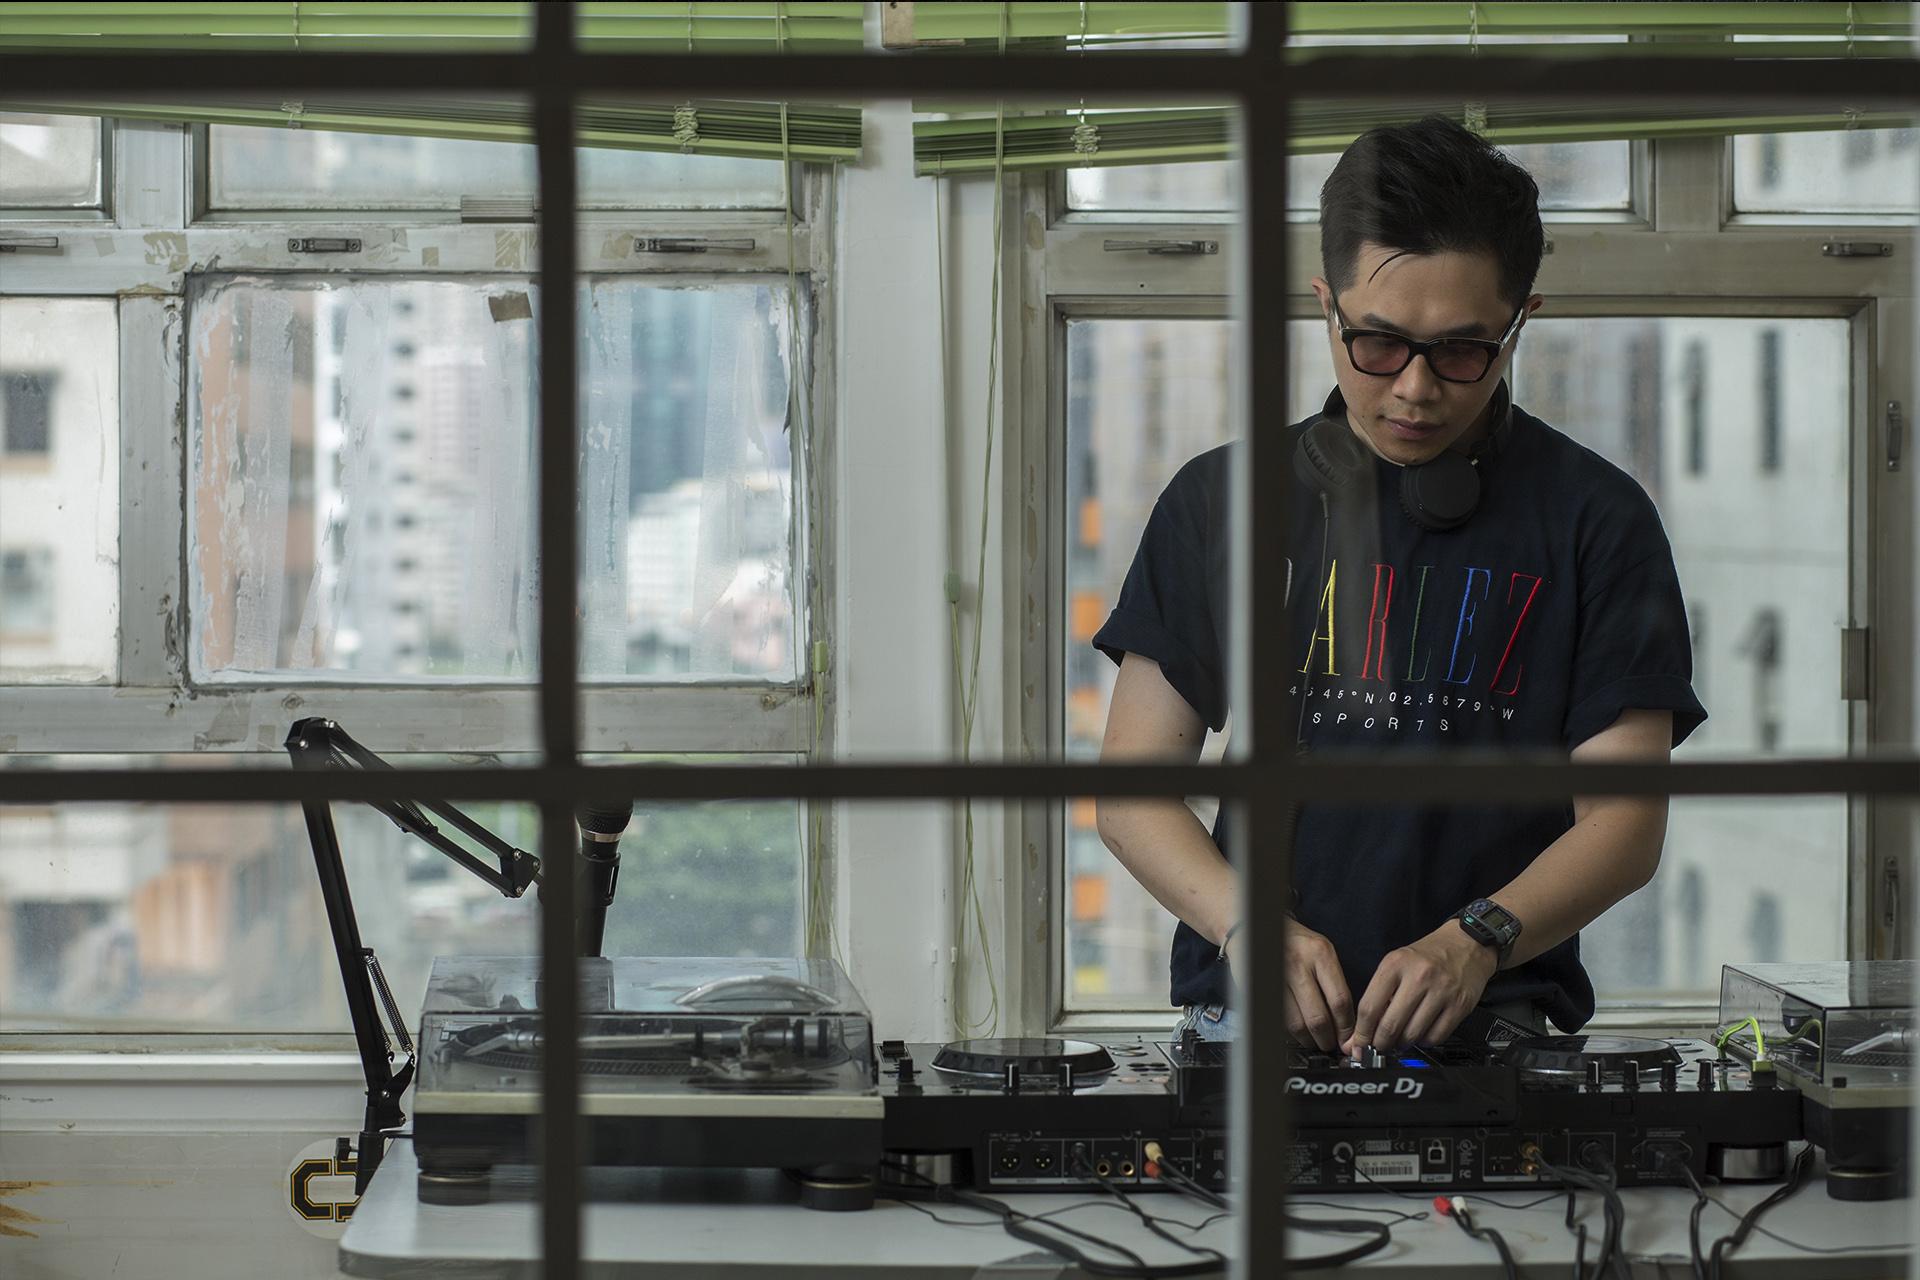 Davy是本地音樂廠牌Neoncity Records的創辦人,同時也是一名DJ,以Daviouxx作藝名。